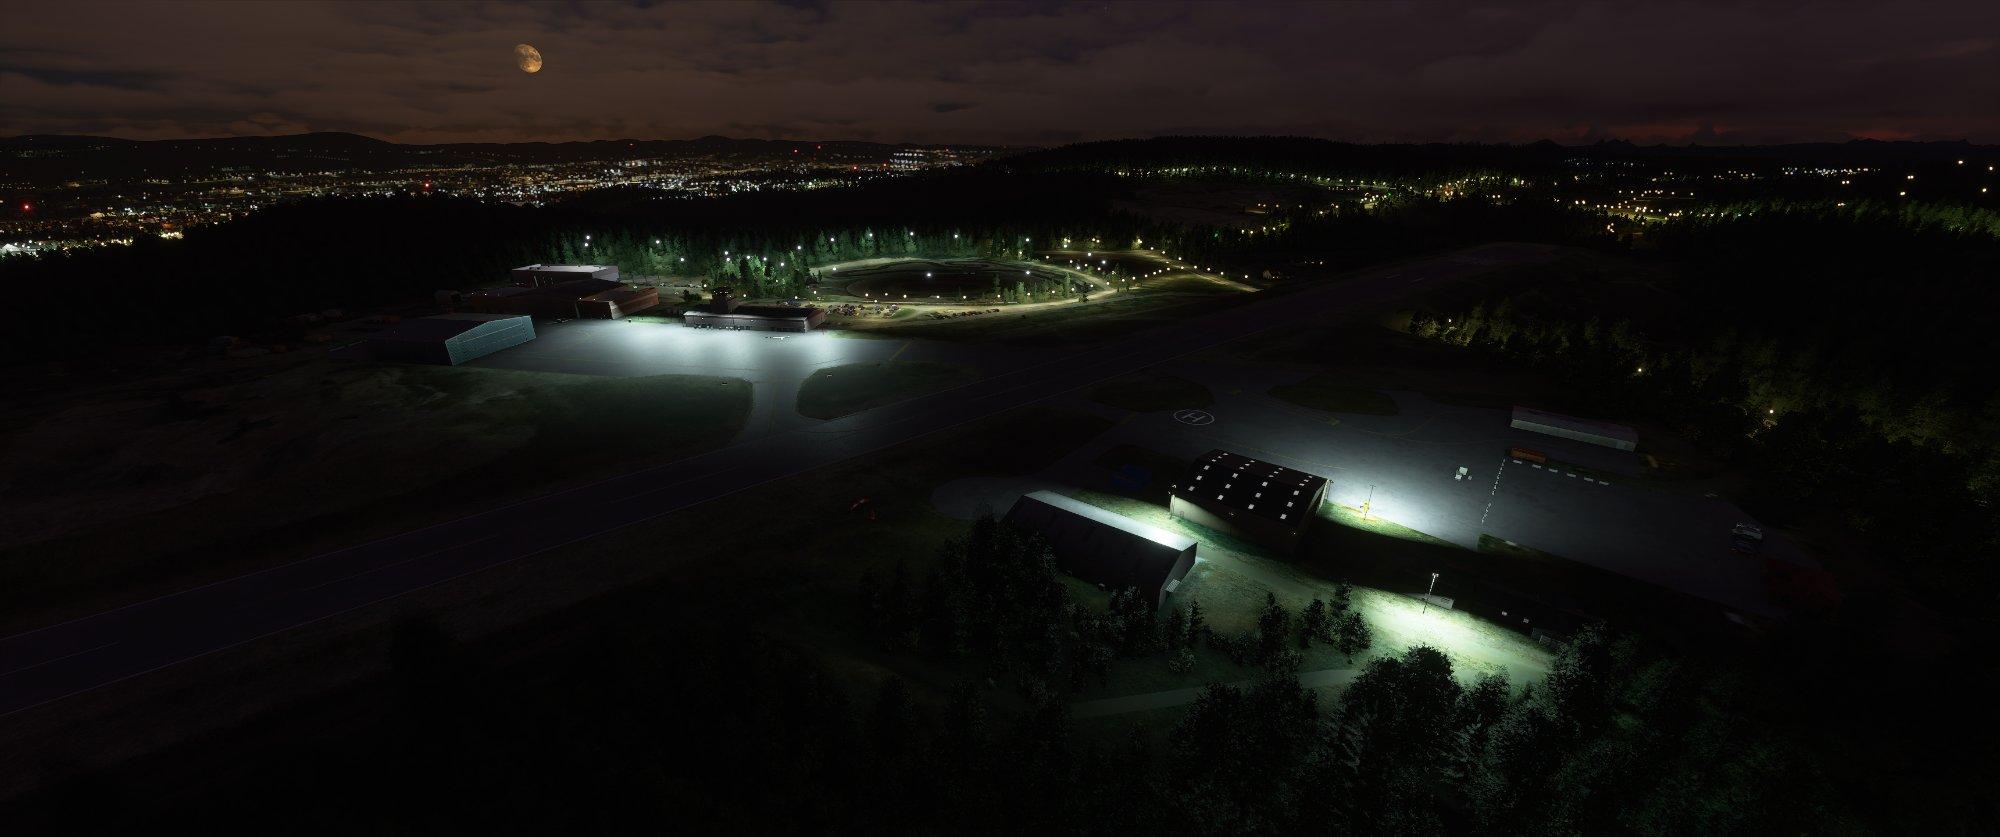 Microsoft Flight Simulator Screenshot 2020.10.28 - 11.42.25.71.jpg